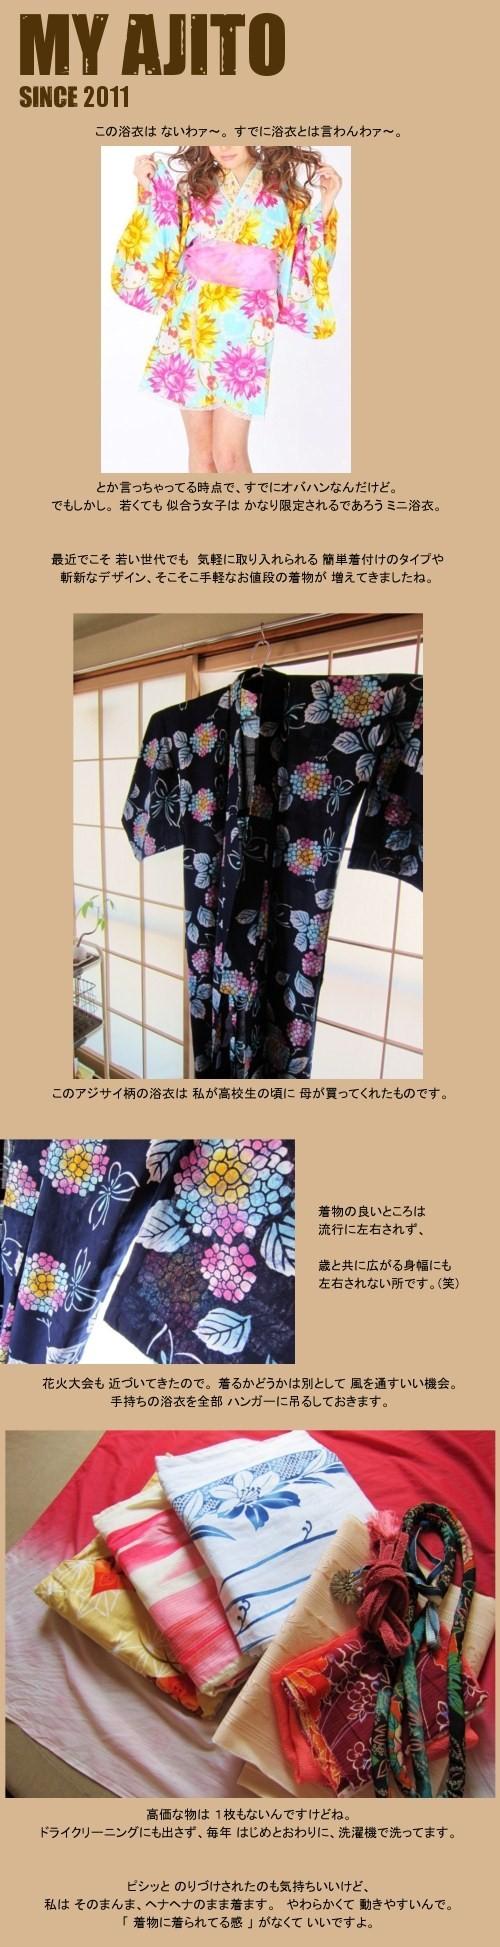 natsu_item_4.jpg